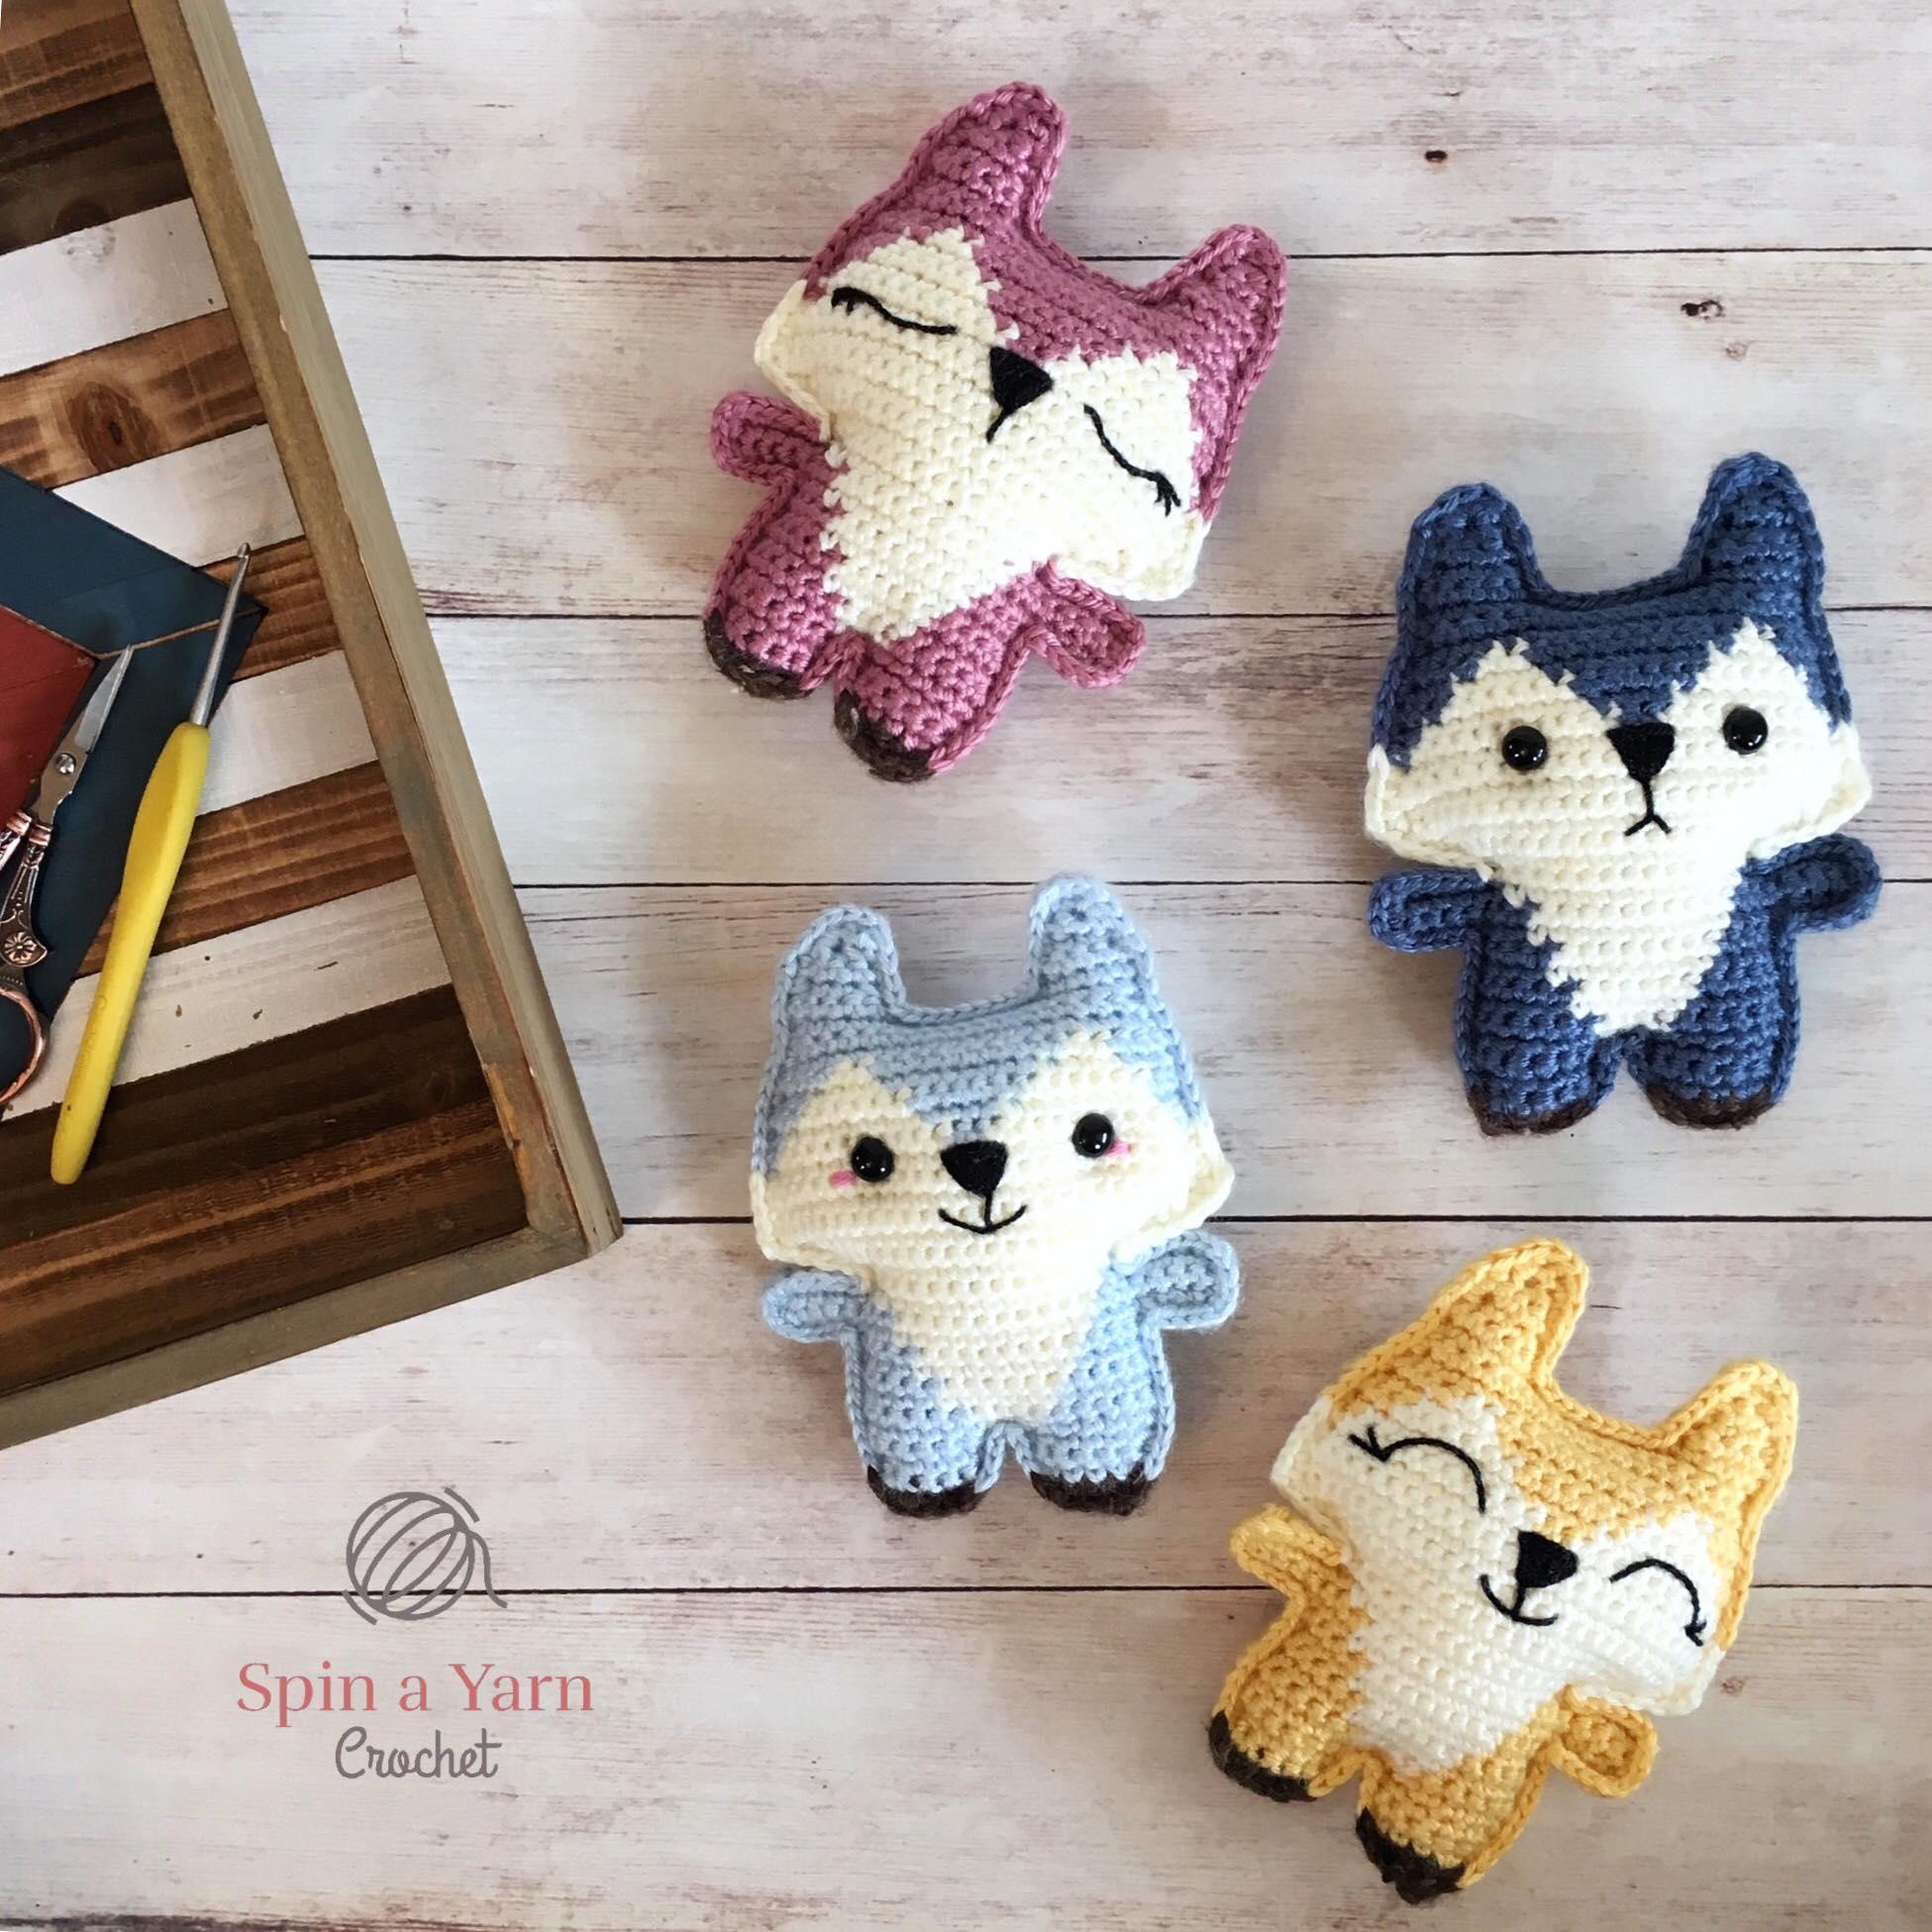 Tiny fox amigurumi pattern - Amigurumi Today | 1951x1951